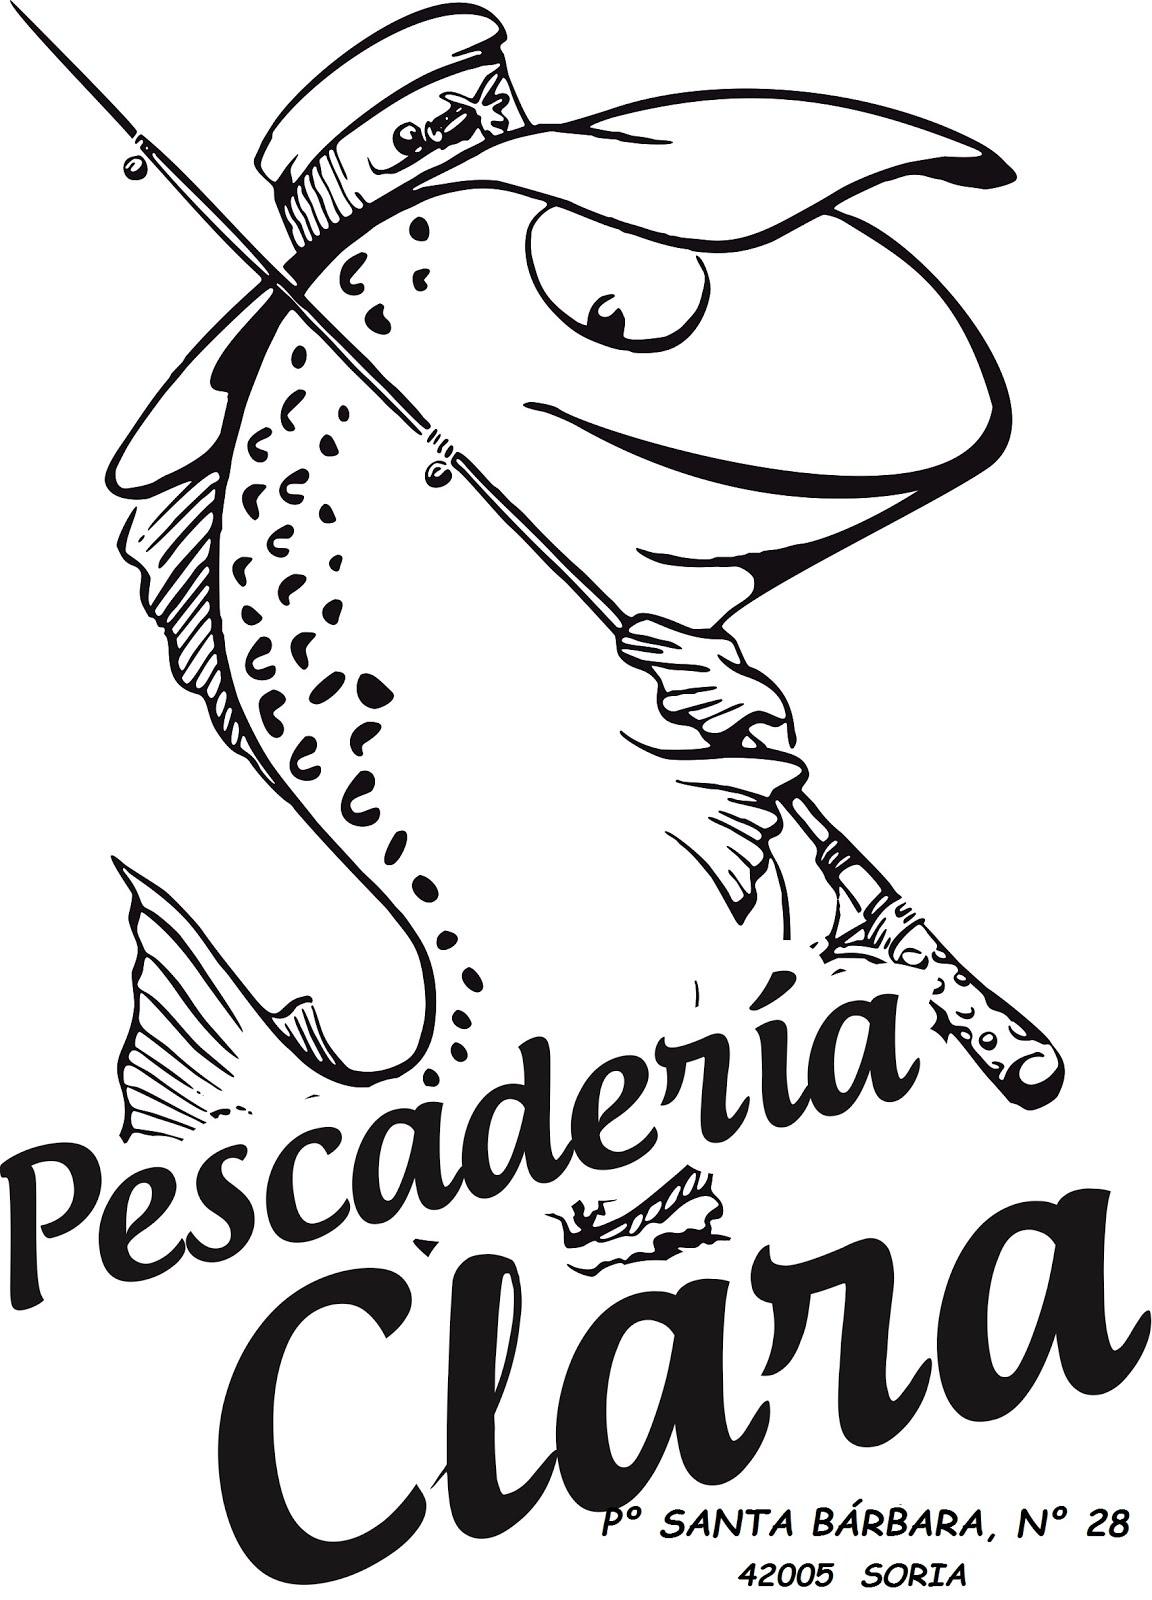 Pescadería Clara